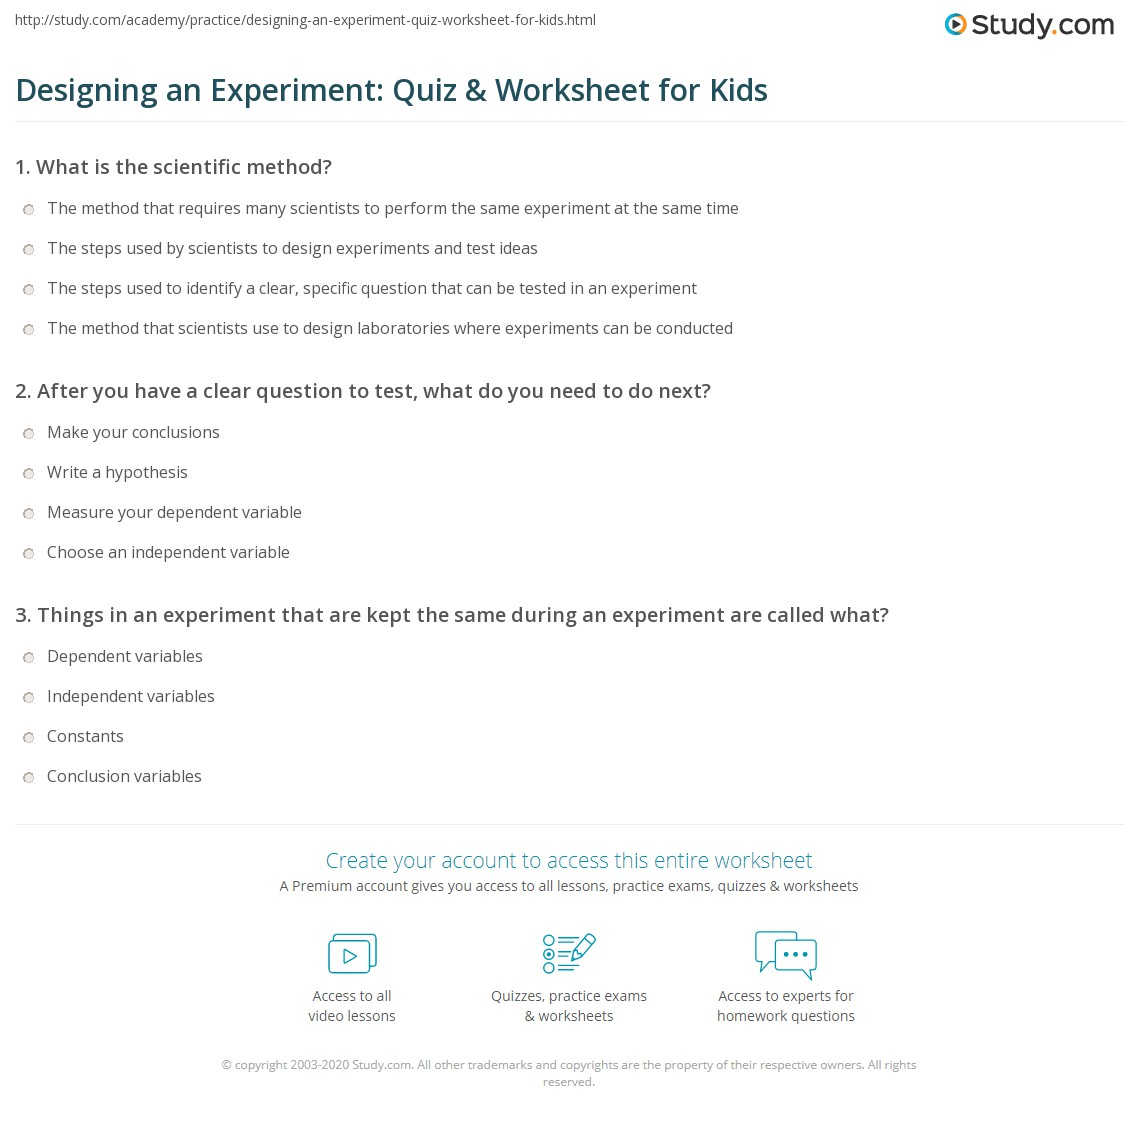 Designing an Experiment: Quiz & Worksheet for Kids | Study.com